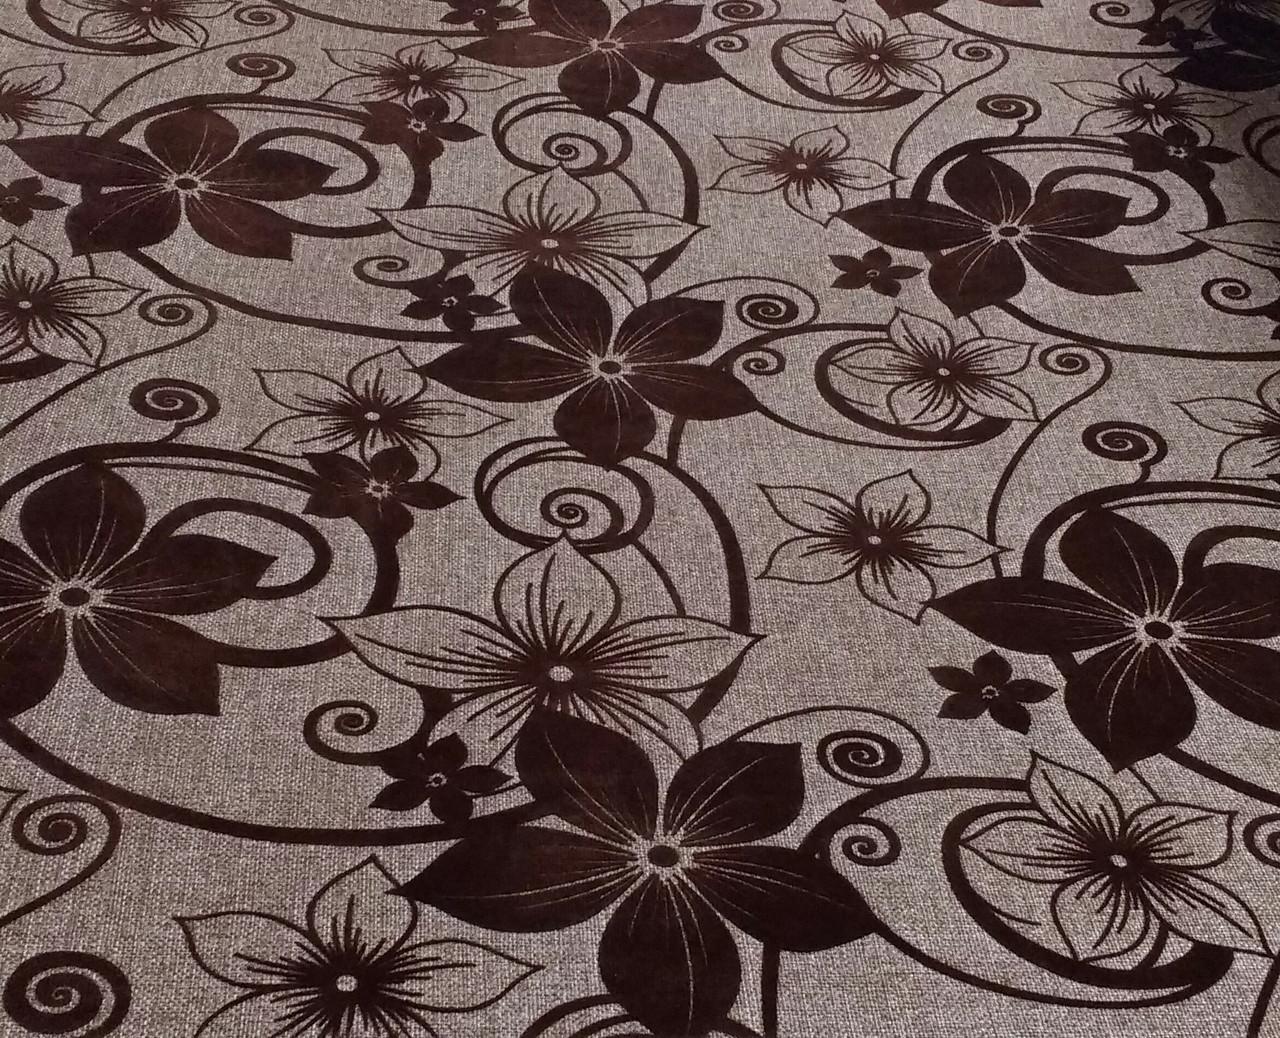 Обивочная ткань для мебели Шервуд кор